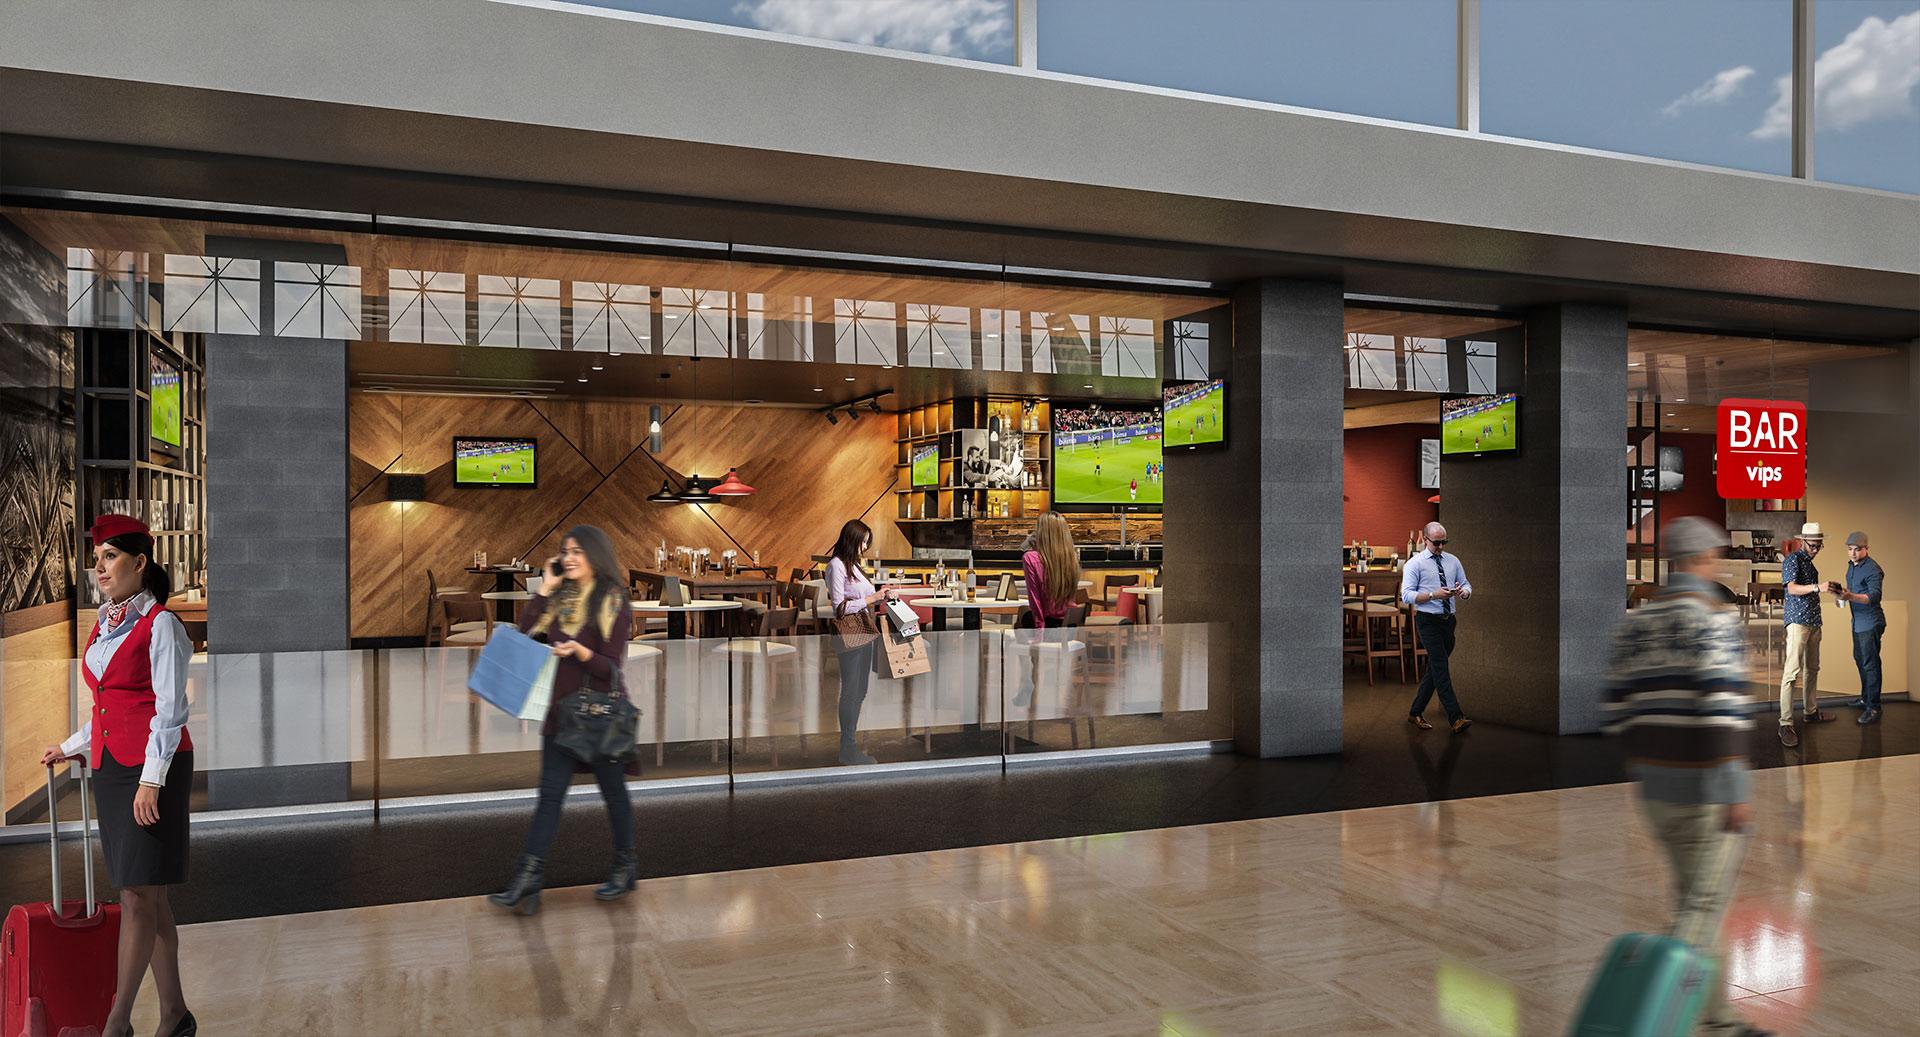 ALSEA Vips Aeropuerto Guadalajara